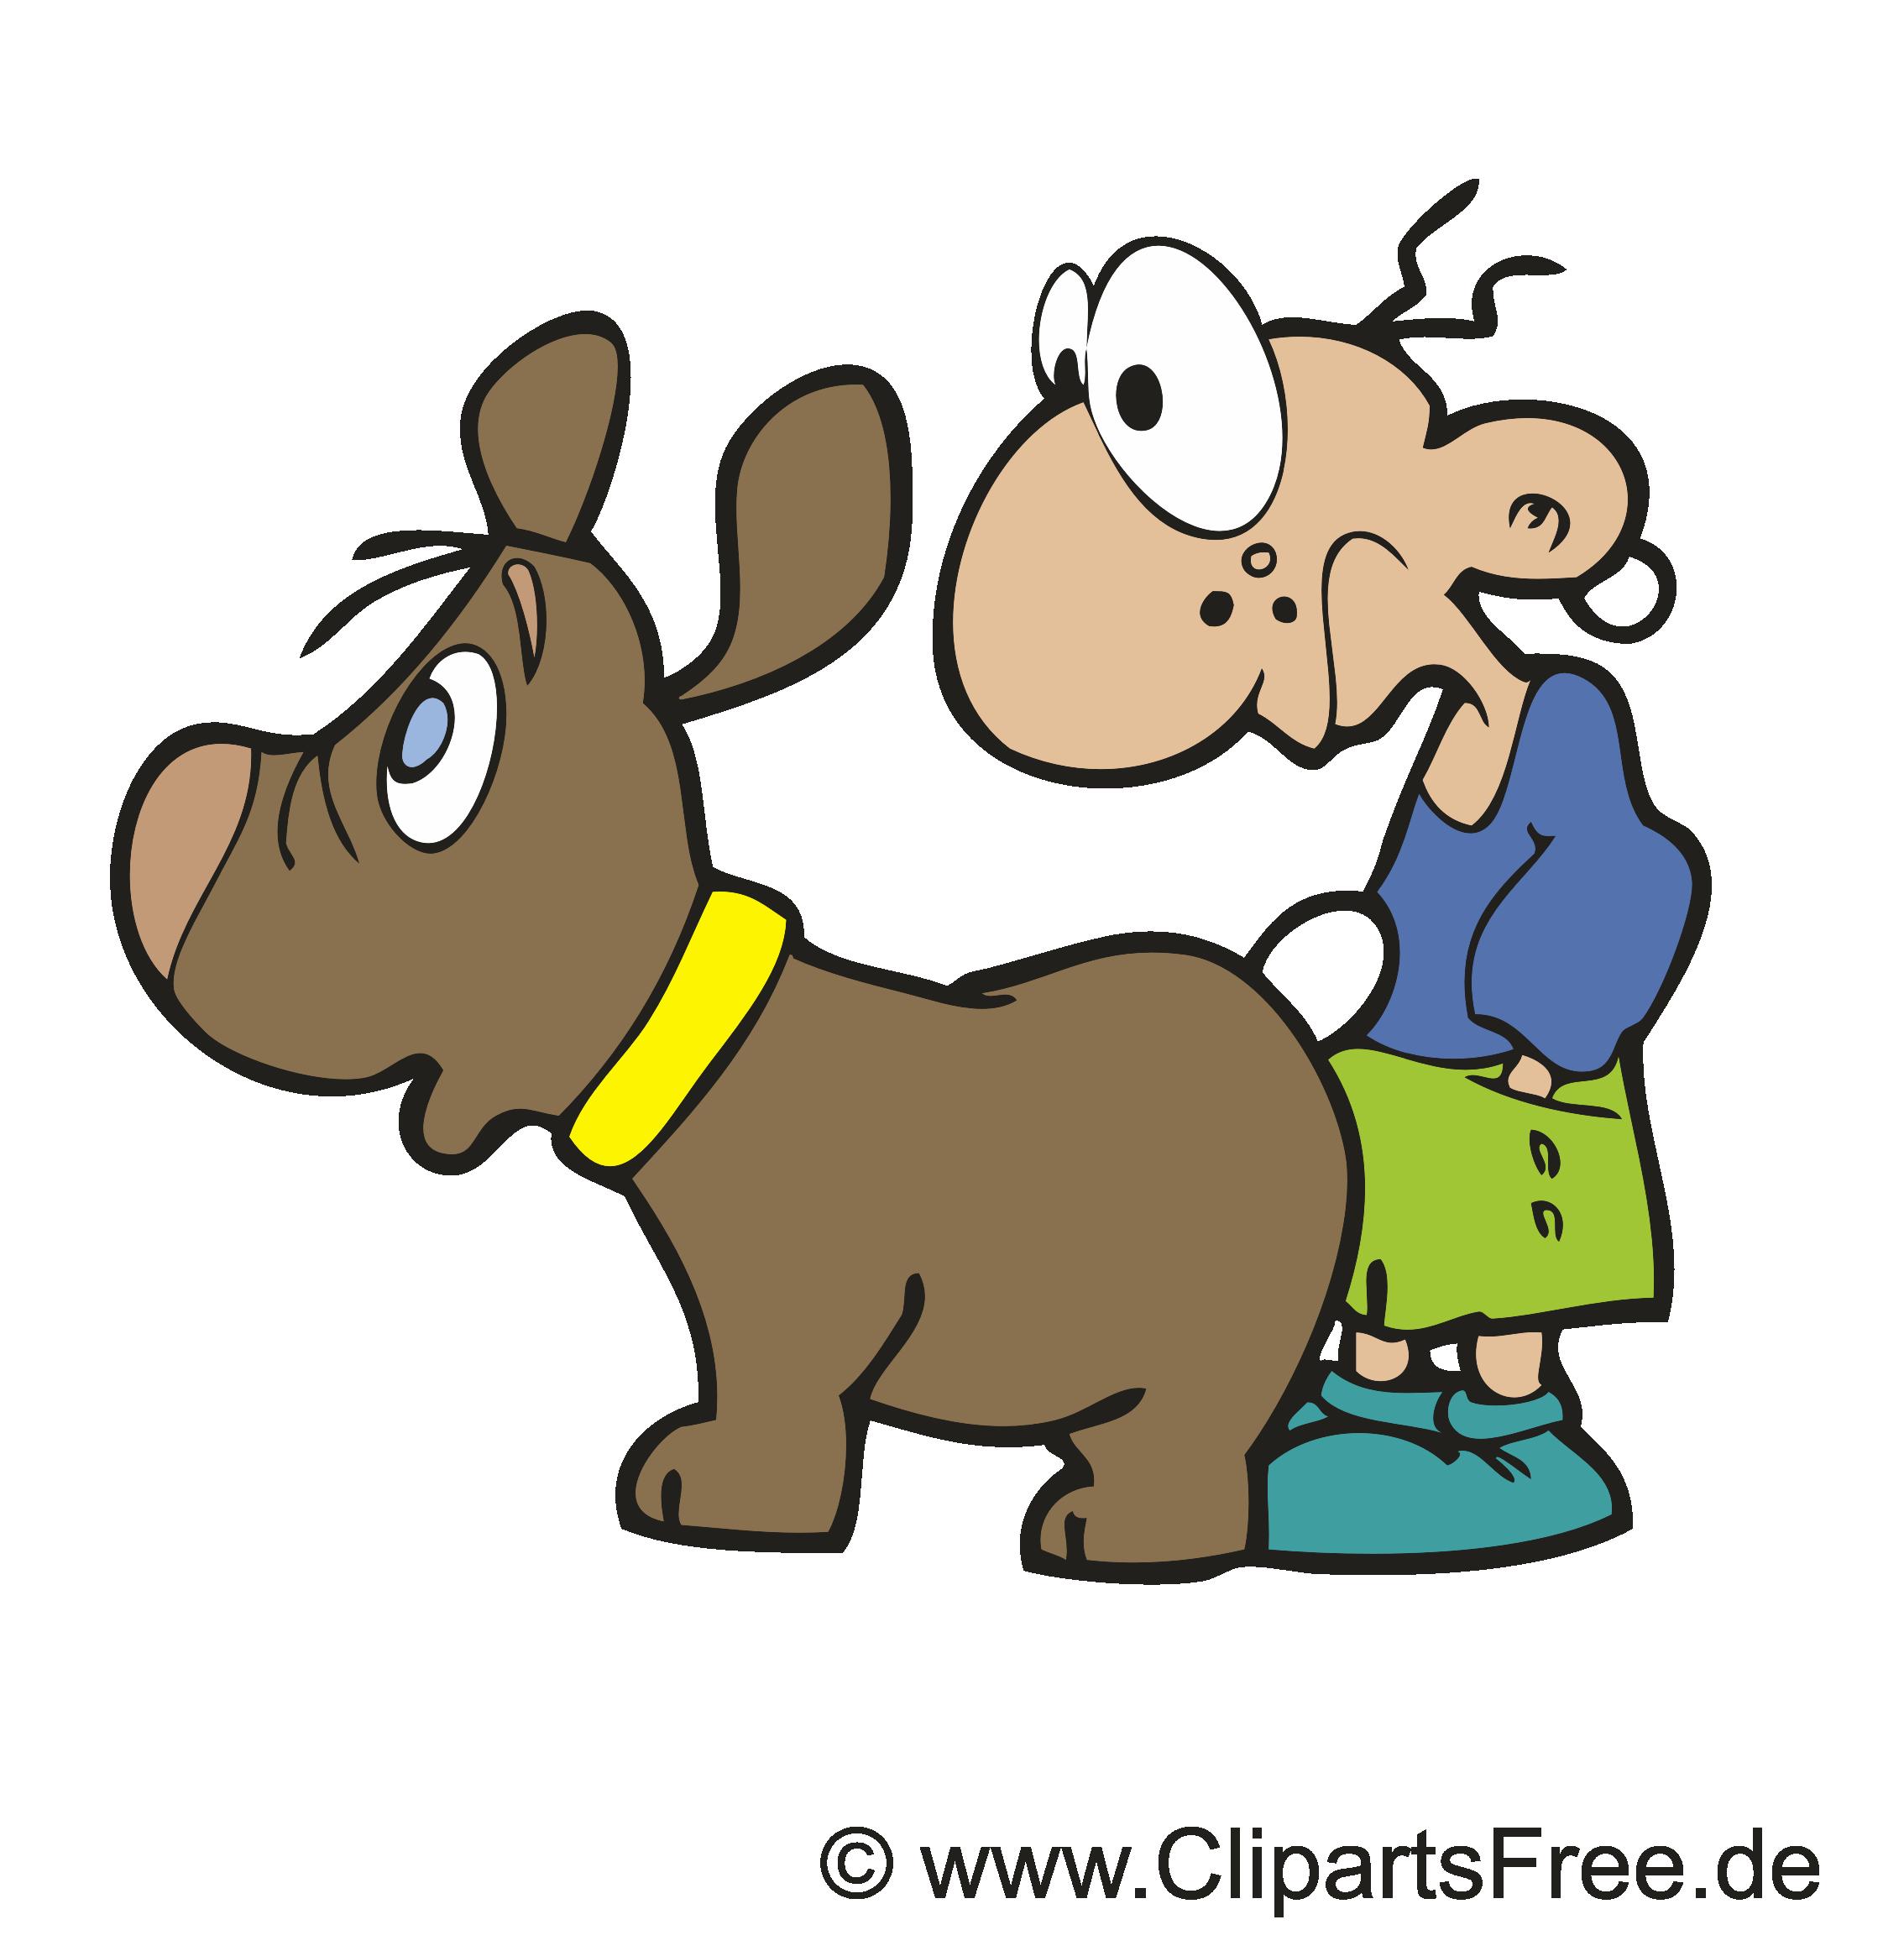 Bild clipart #4, Download drawings